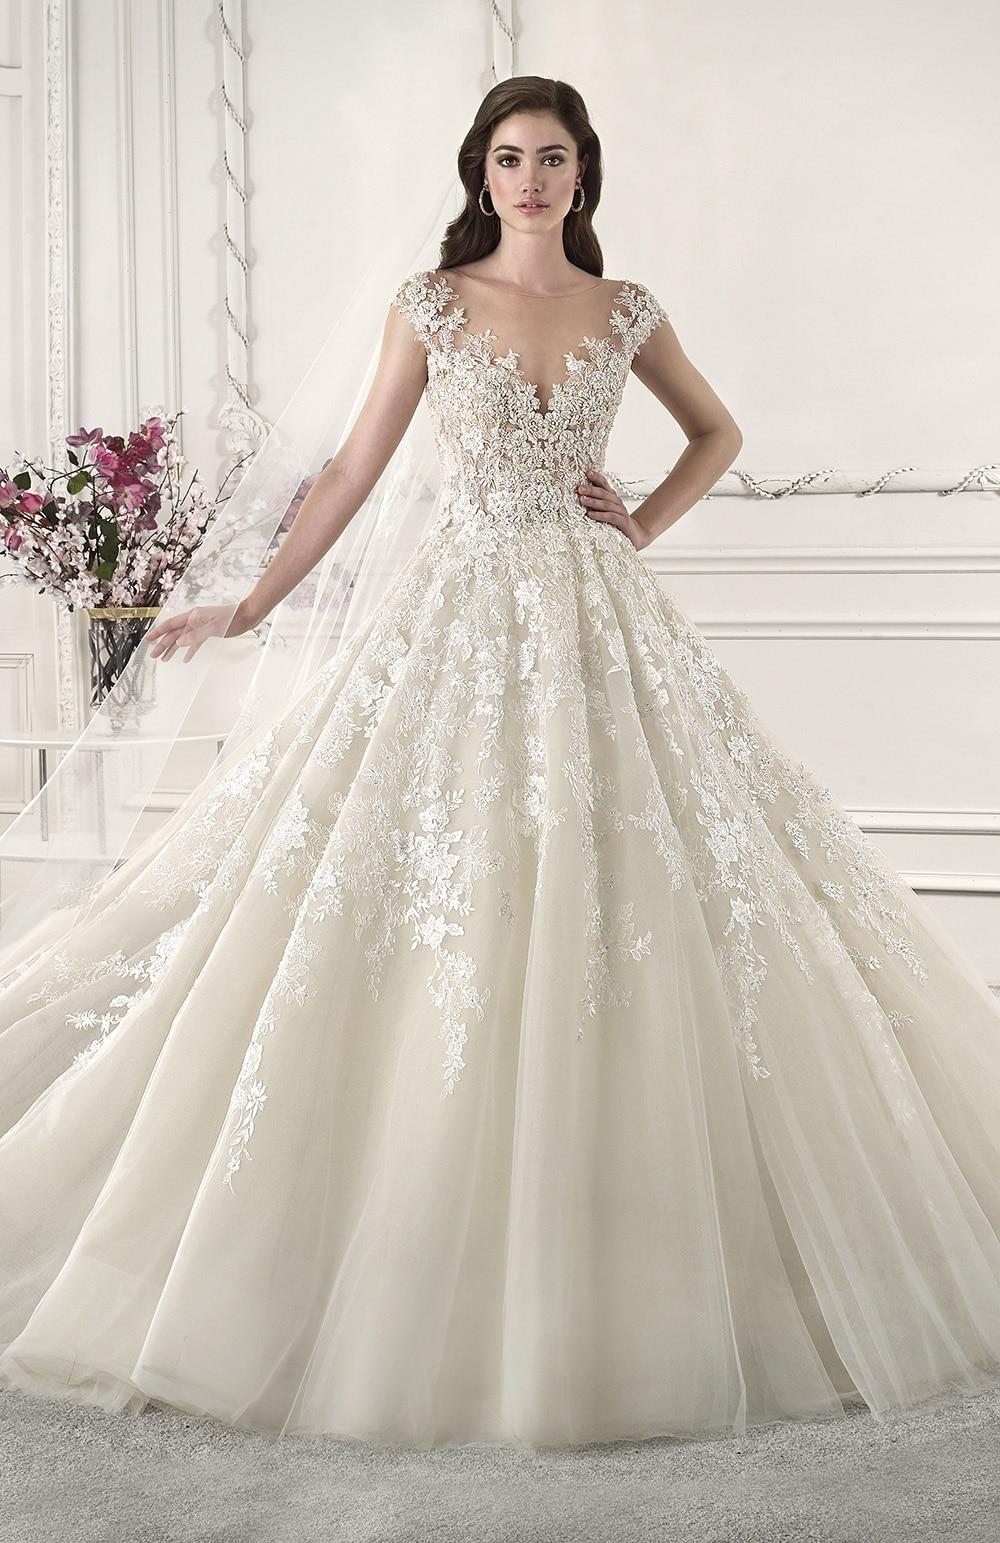 Robe de mariée Modèle Ema – 873